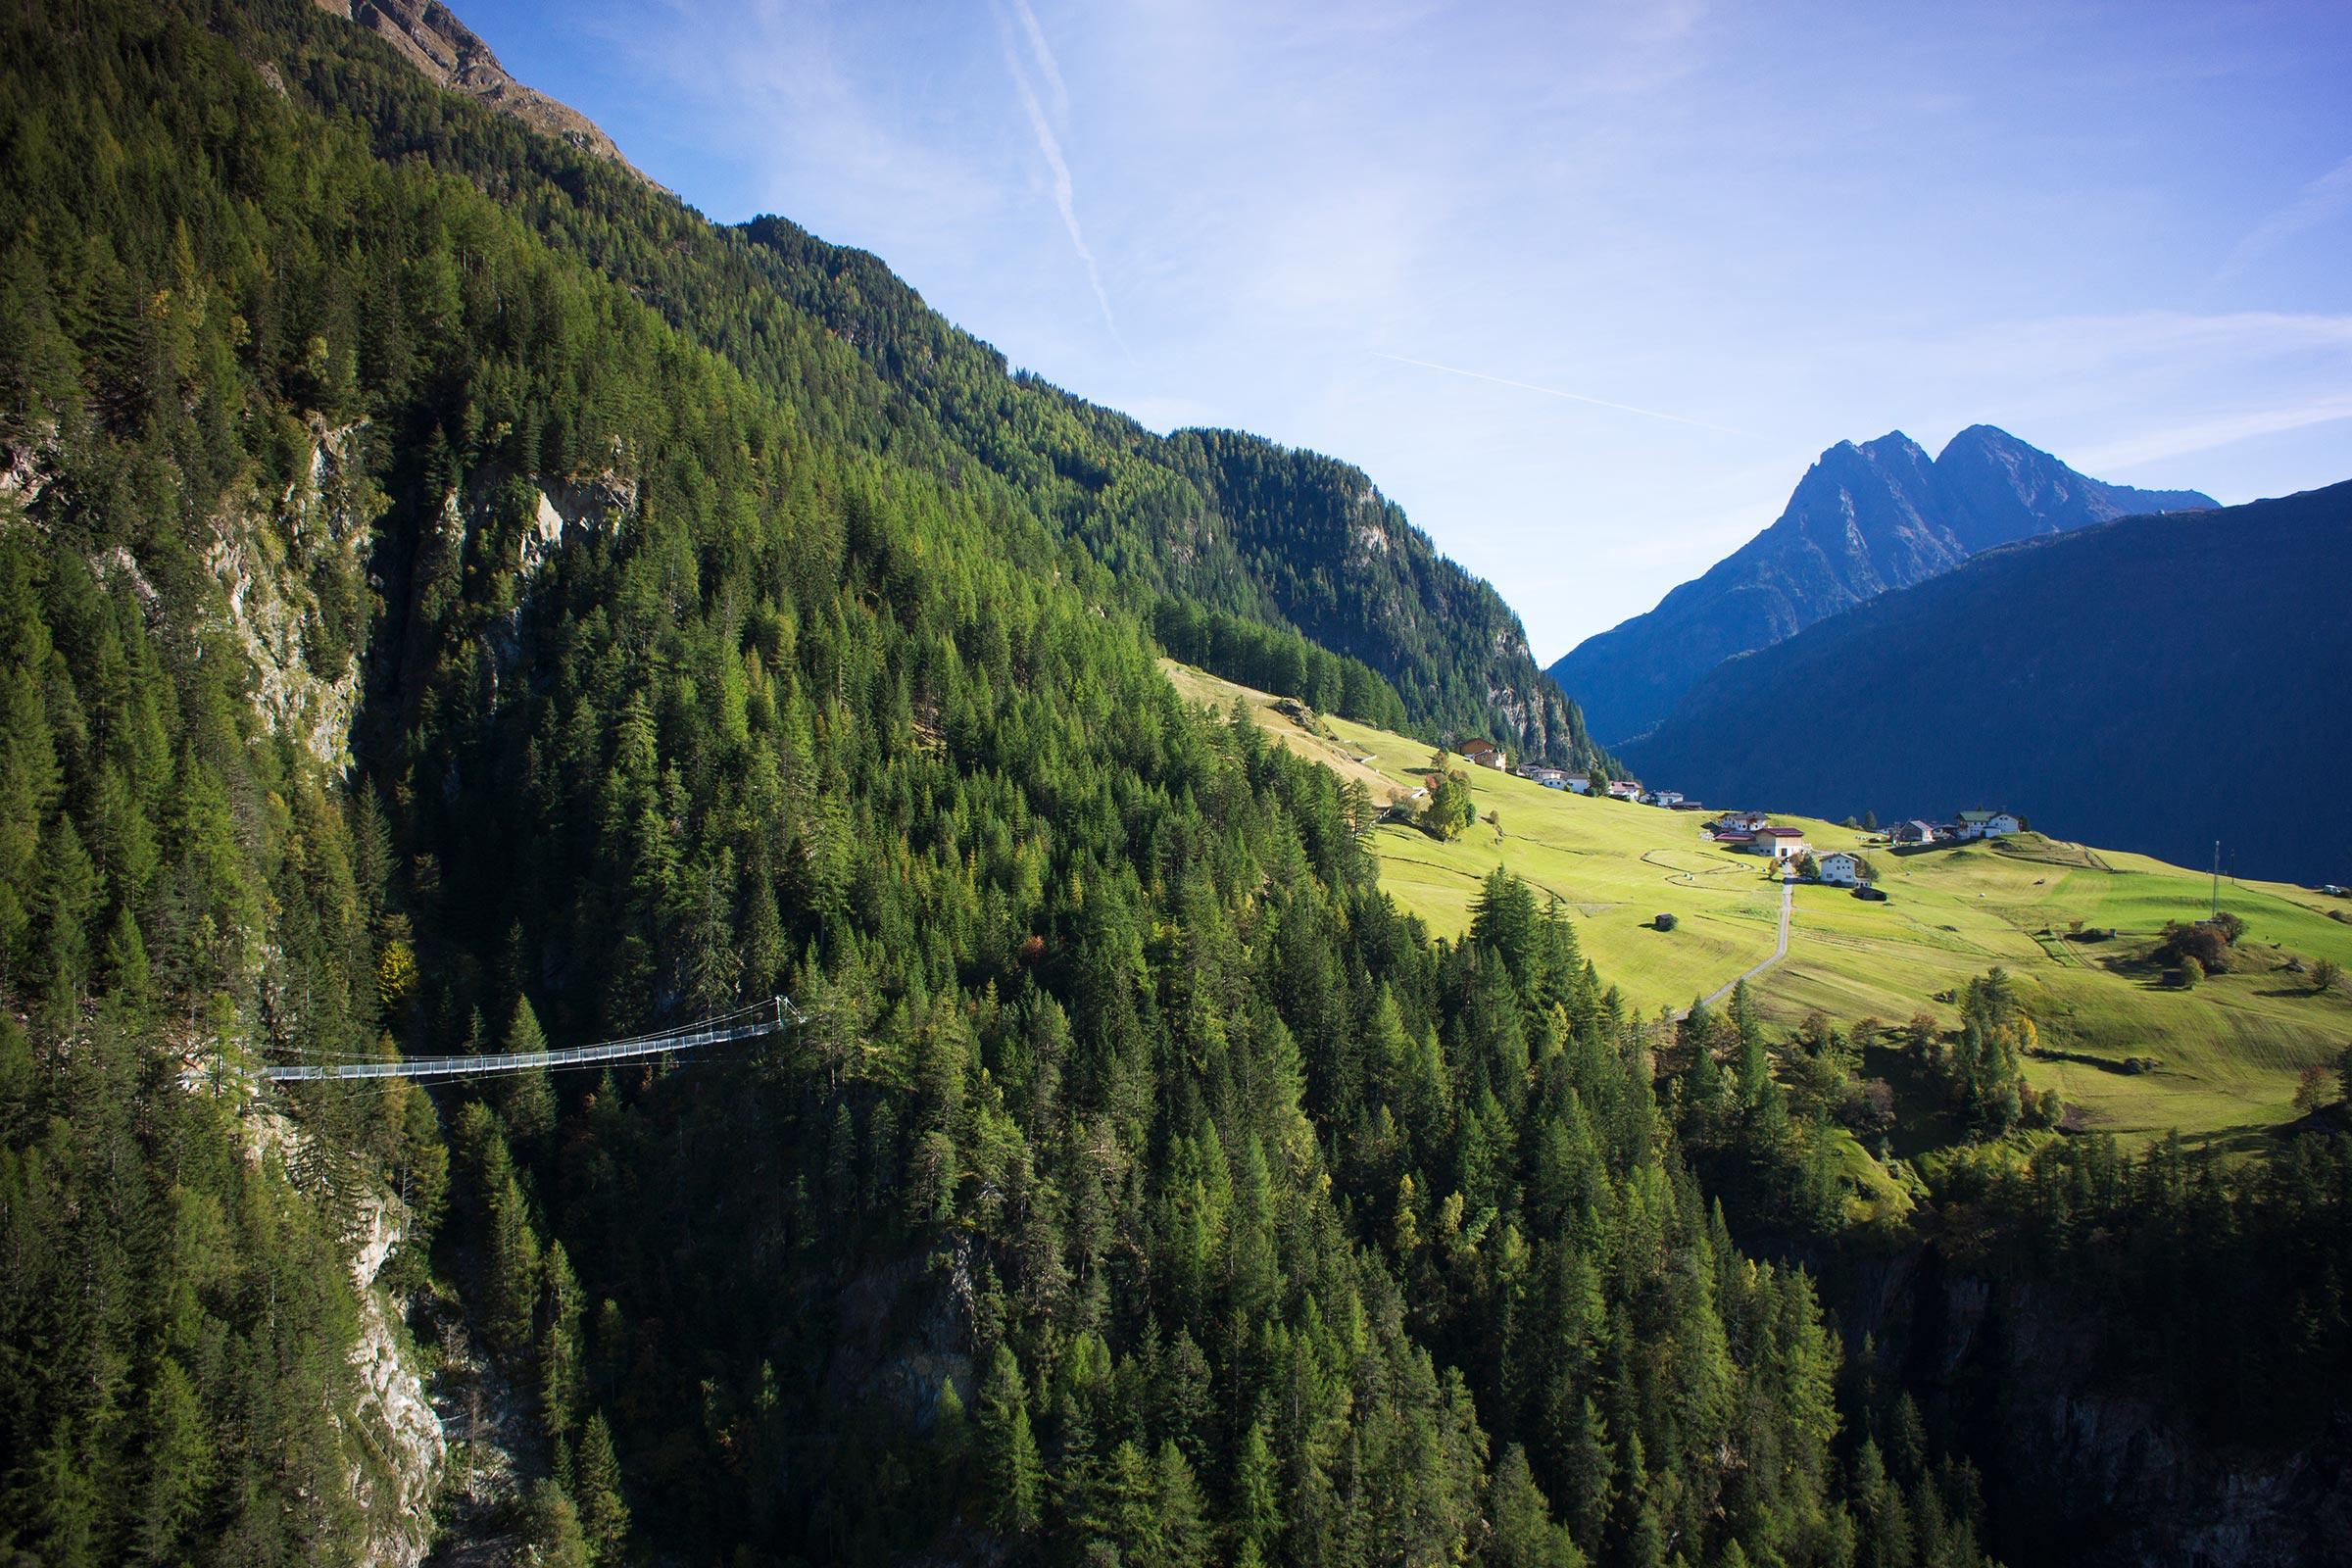 Hängebrücke Burgstein - Ötztaler Urweg